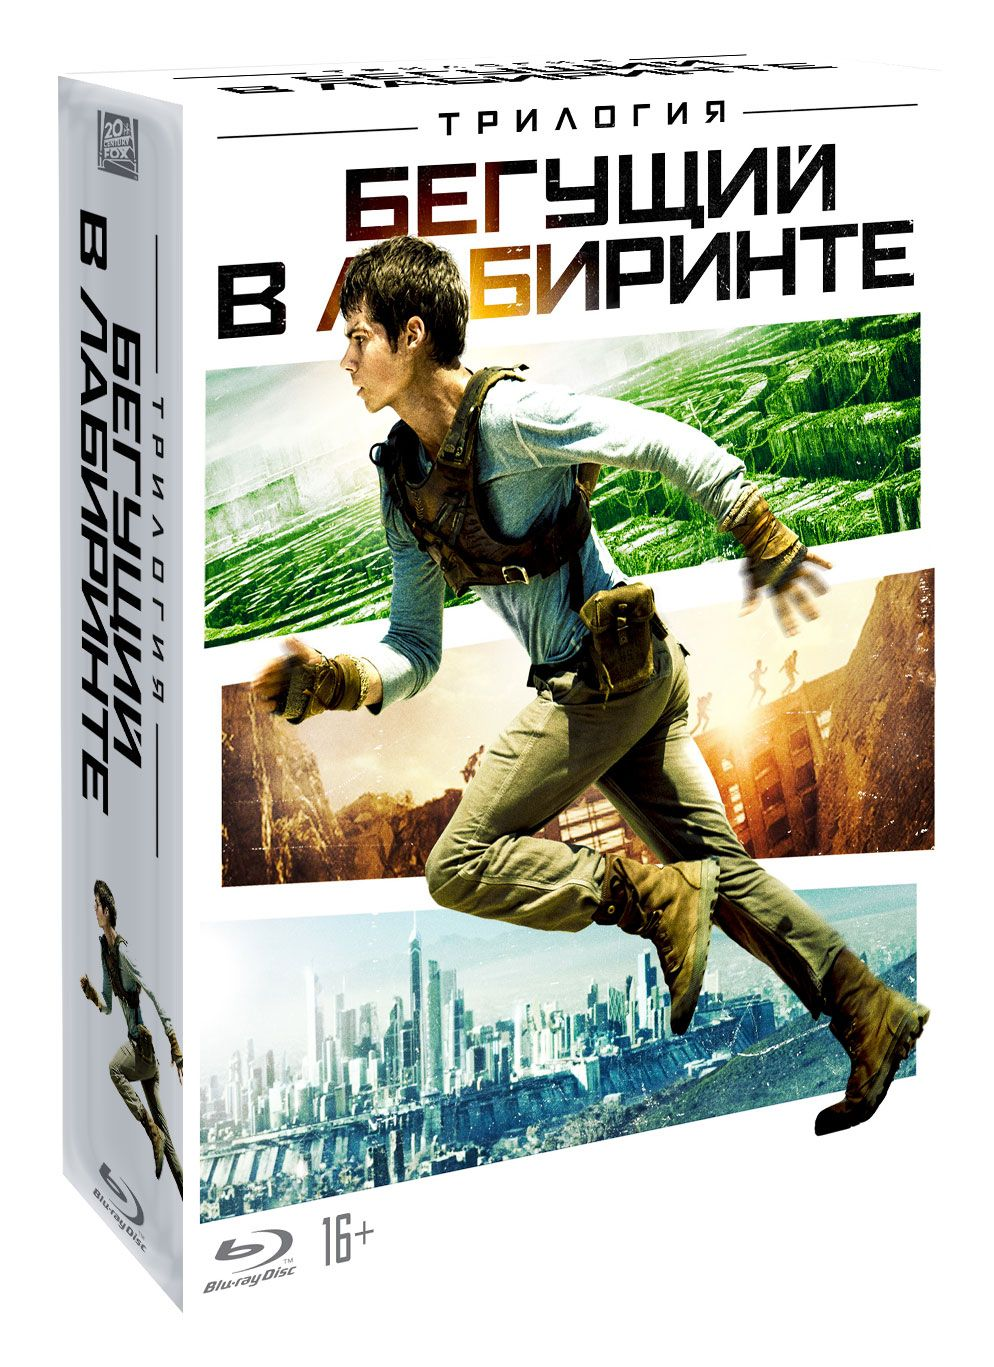 Бегущий в лабиринте. Трилогия (3 Blu-ray) хоббит трилогия режиссерская версия 6 blu ray 3d 9blu ray